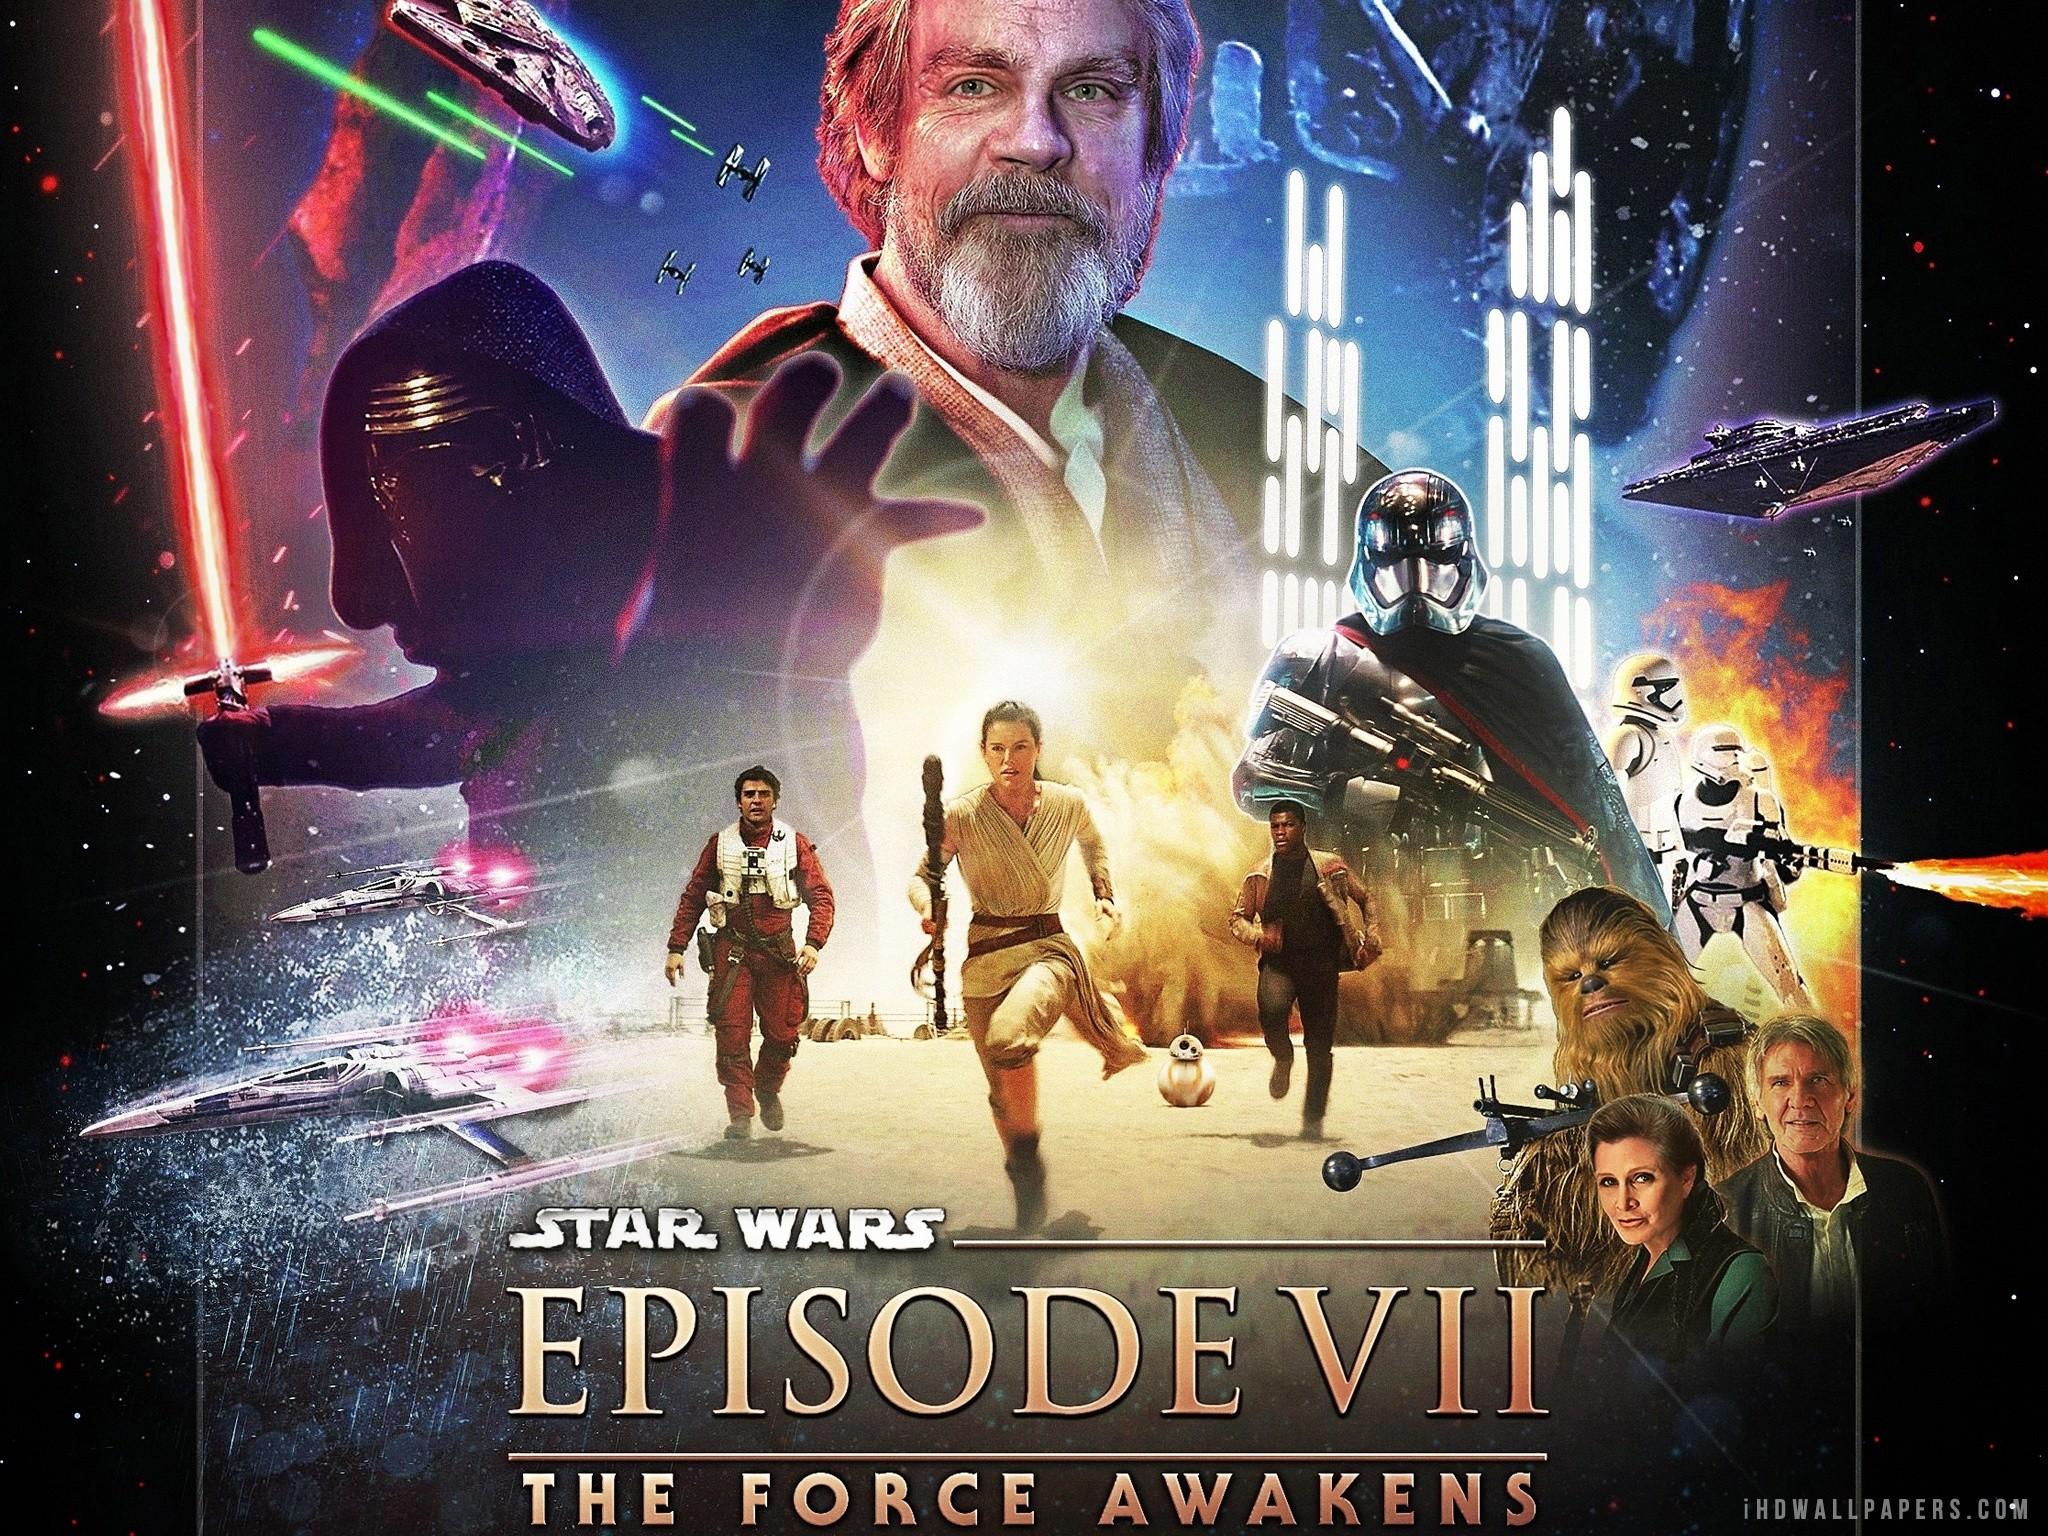 star wars full movie download